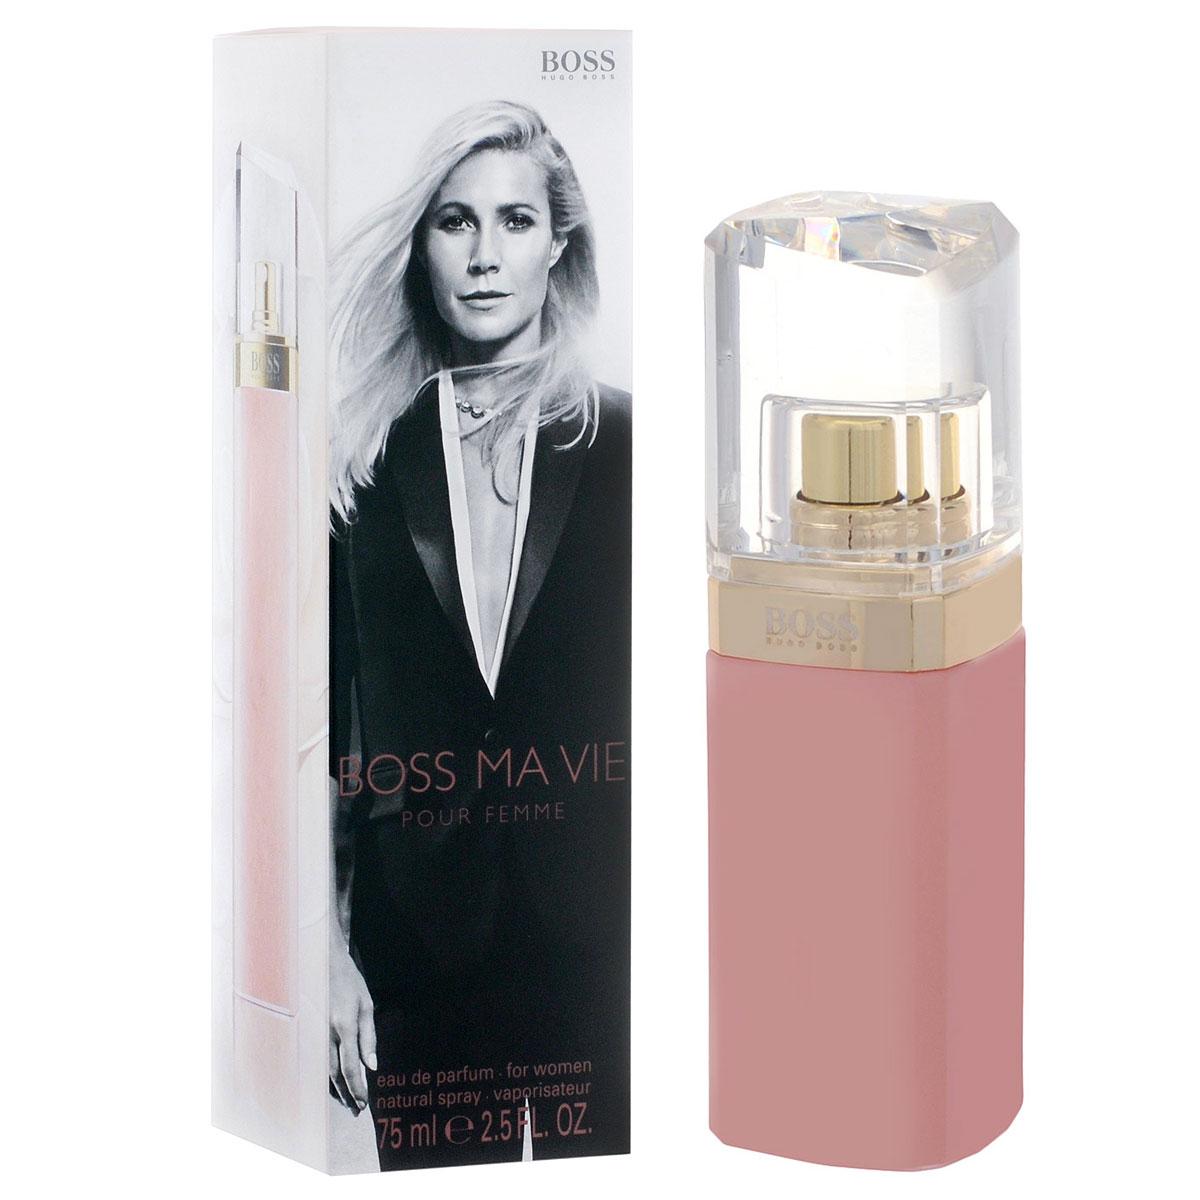 Hugo Boss Парфюмерная вода Ma Vie, женская, 75 мл lancome la vie est belle intense парфюмерная вода женская 75 мл